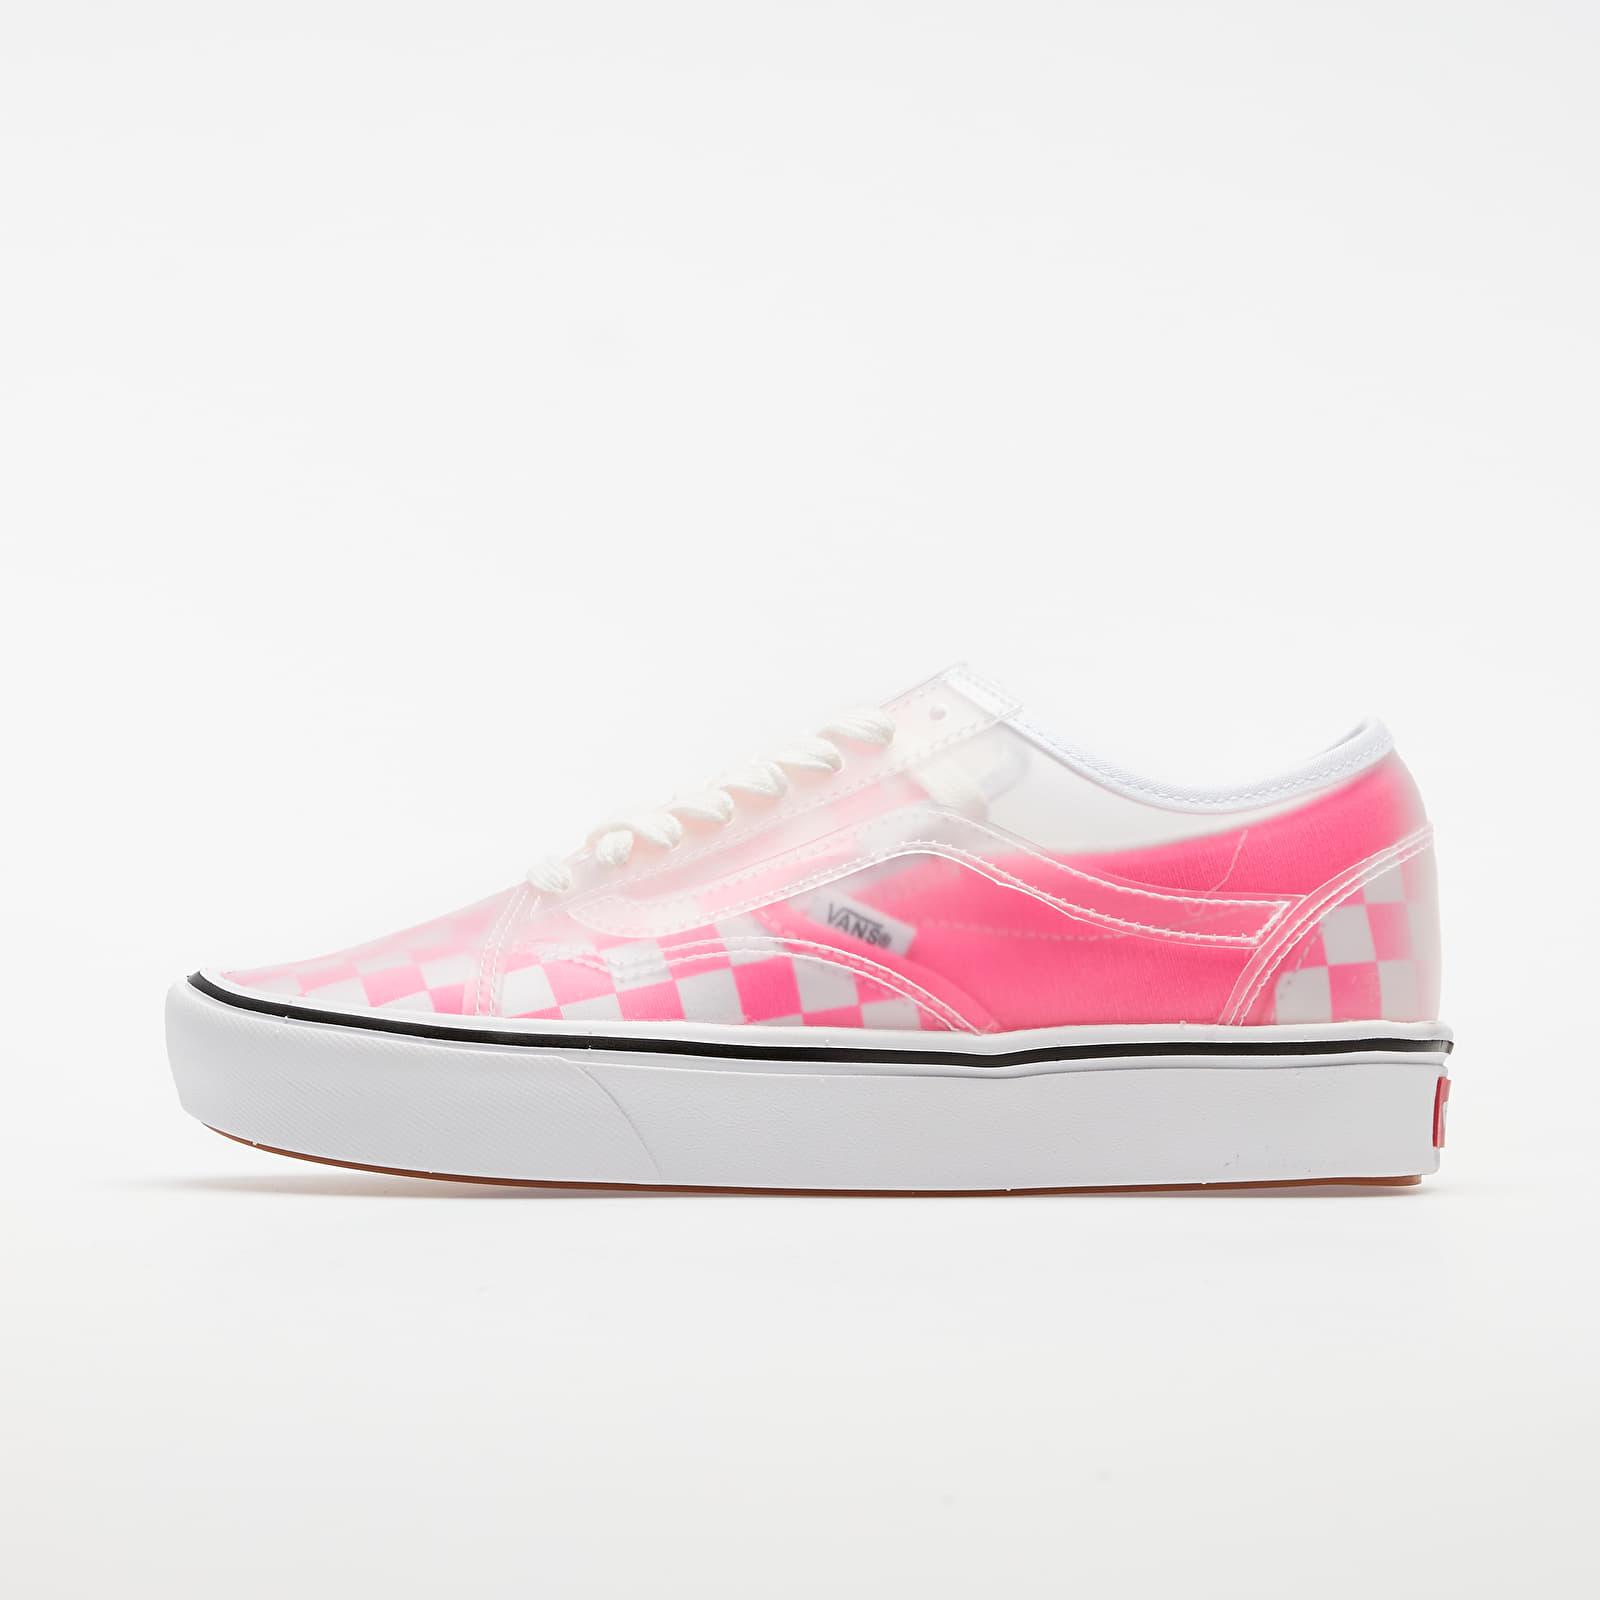 Men's shoes Vans ComfyCush Slip-Skool (Checkerboard) Pink/ True White